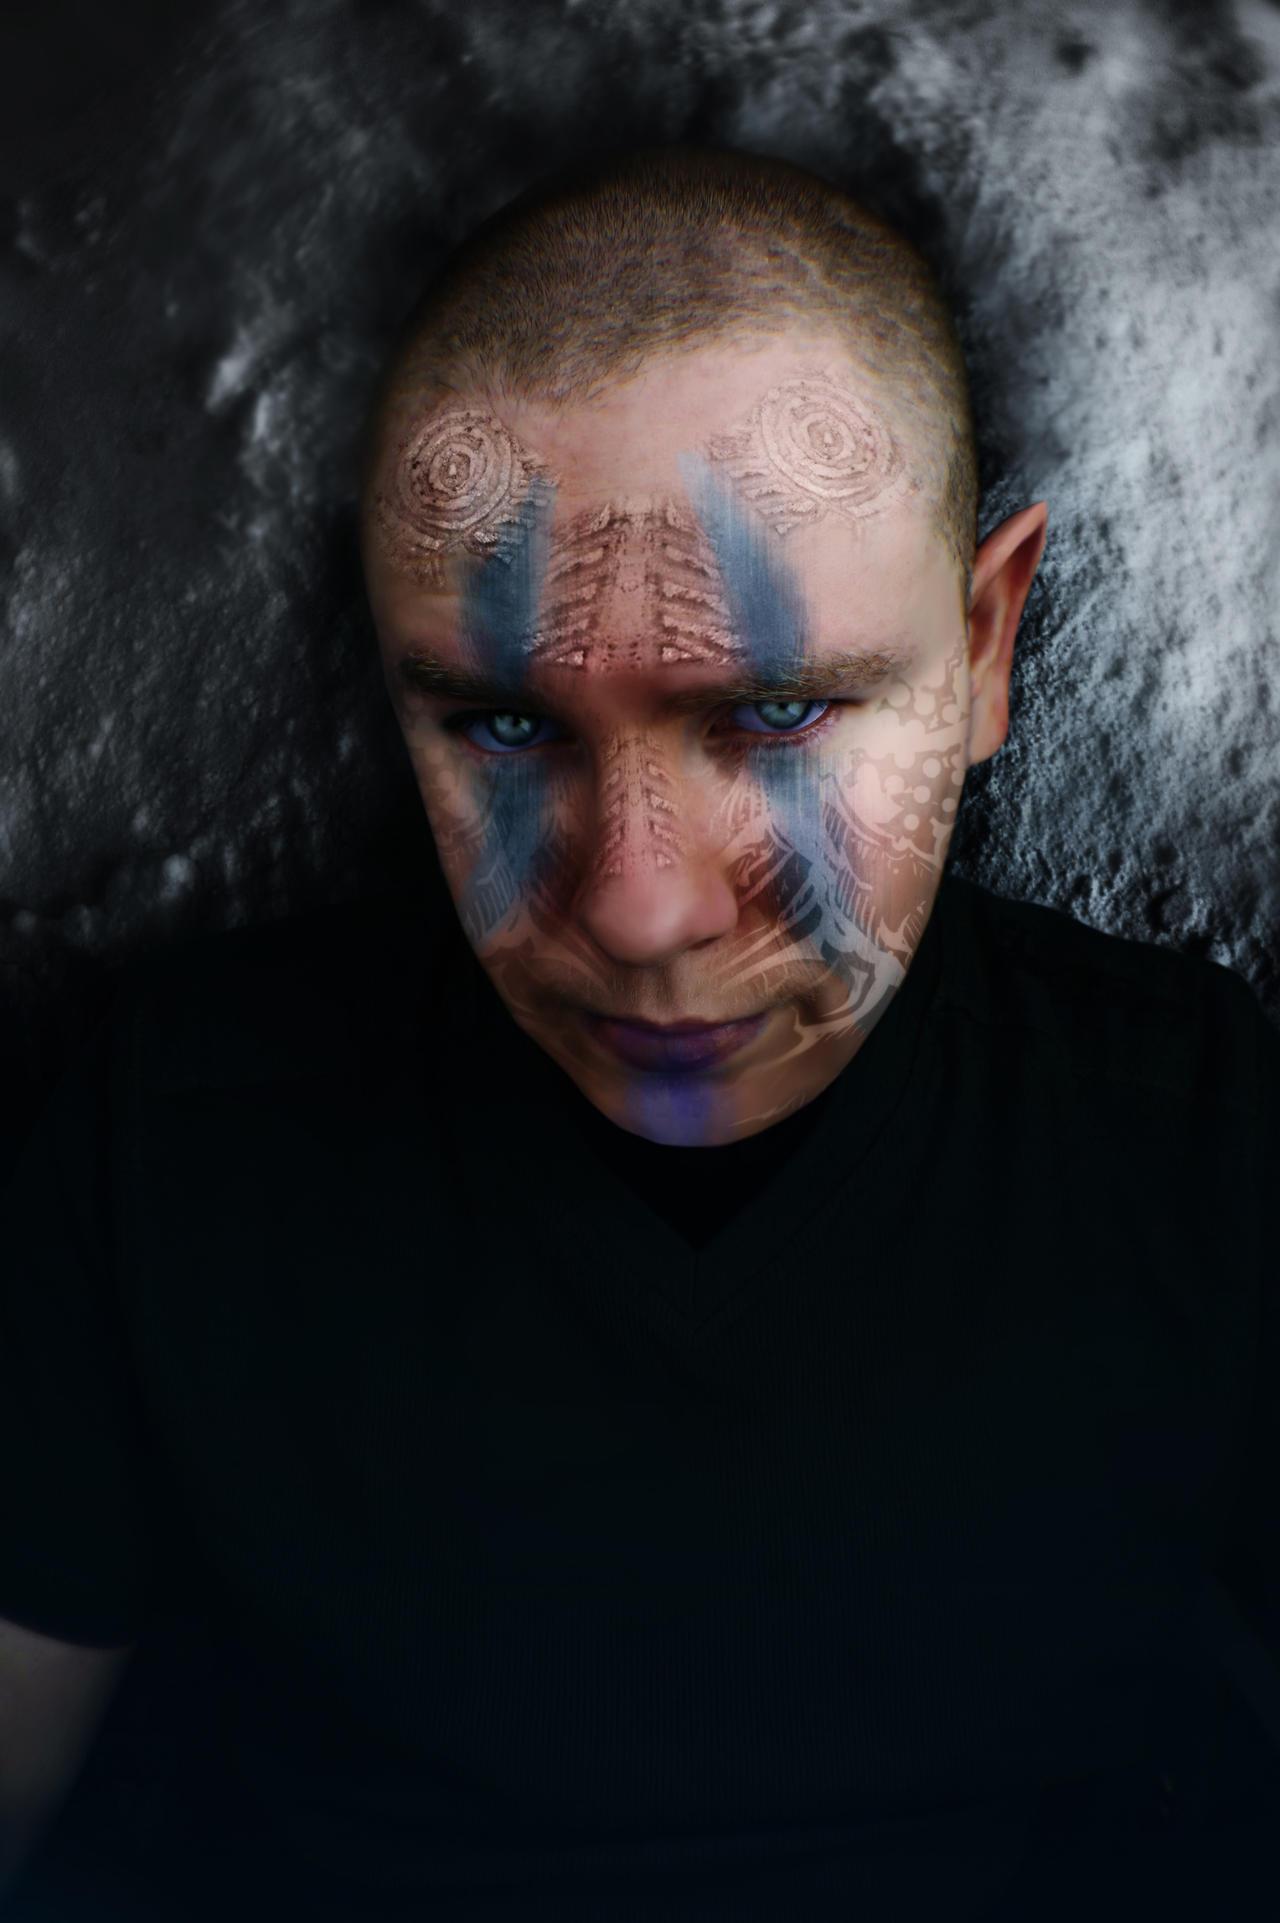 humanoid alien races